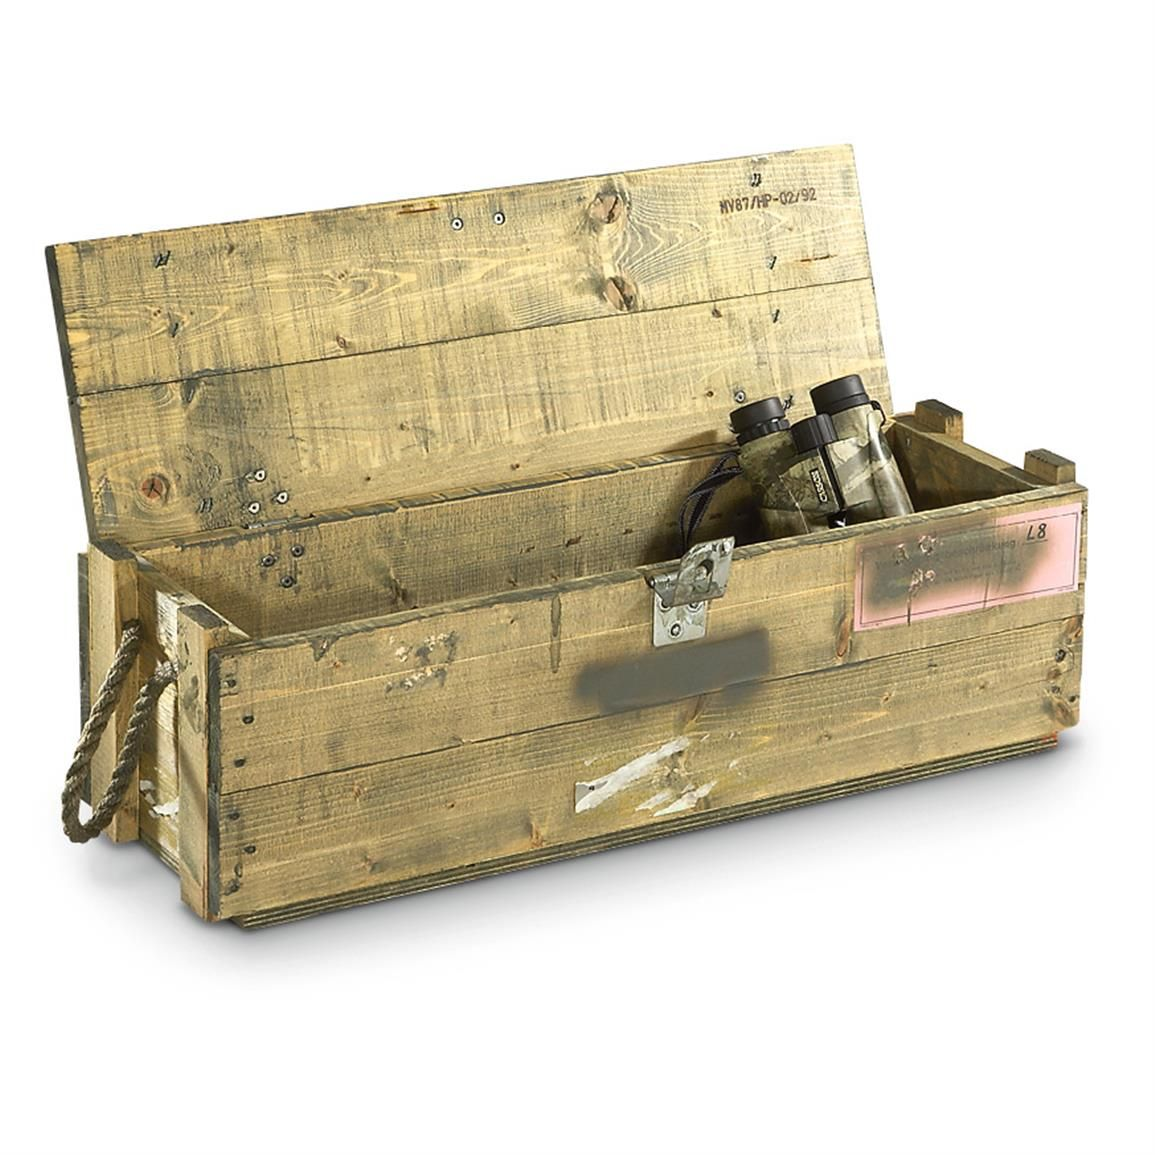 Used Austrian Military Surplus Ammo Box / Foot Locker   Wishlist ...